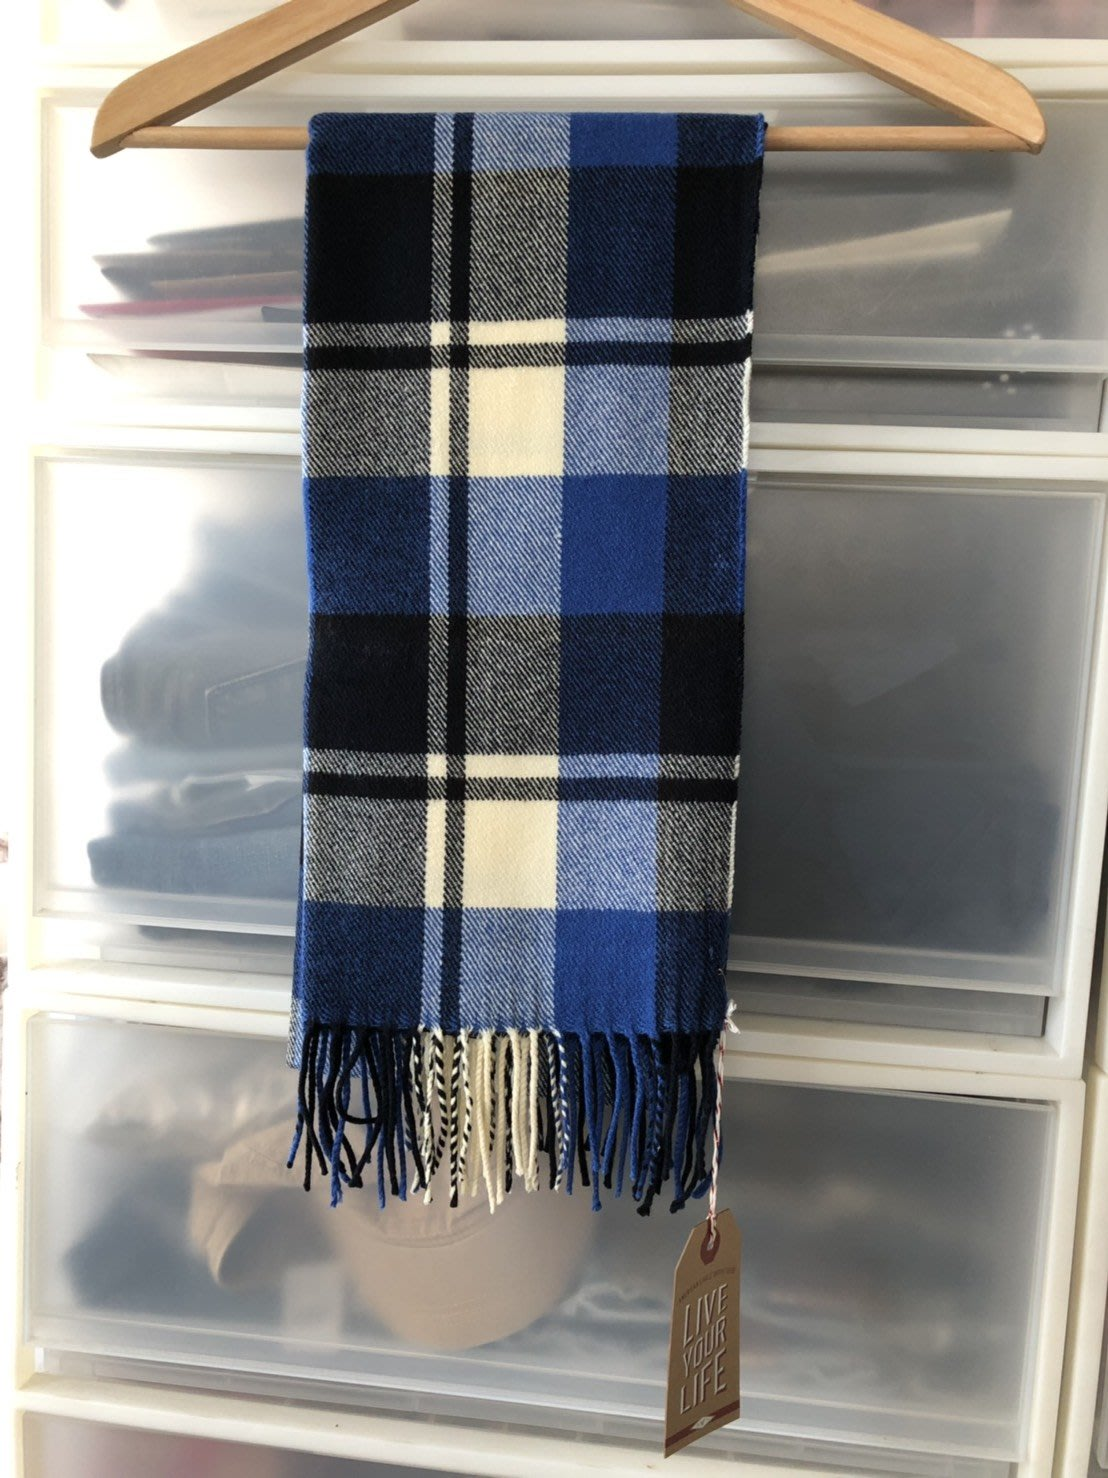 美國 AMERICAN EAGLE 老鷹 格紋圍巾現貨